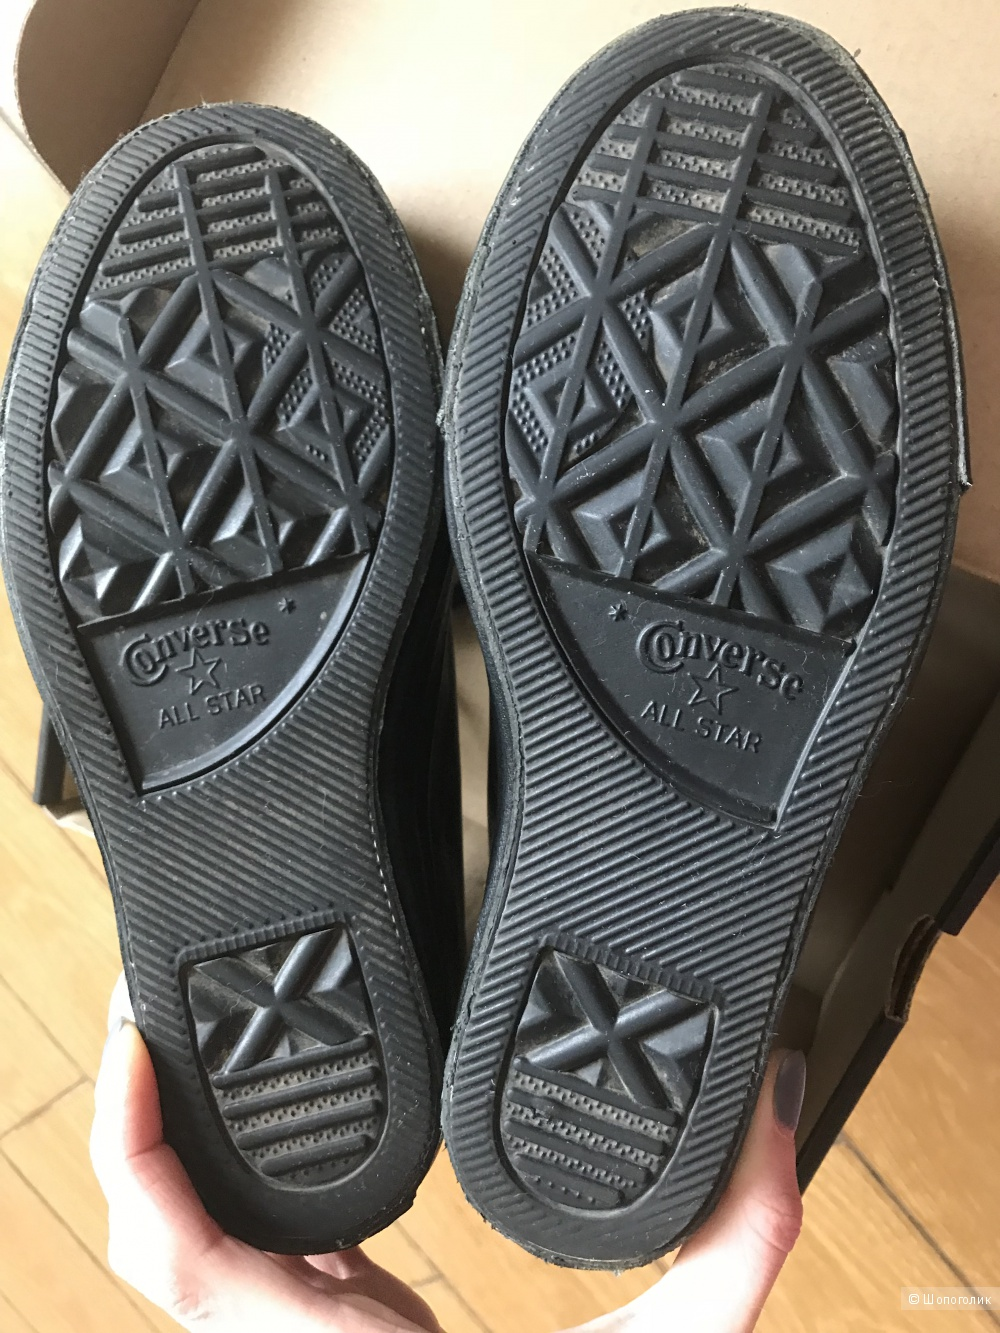 Кожаные ботинки Converse, размер 37